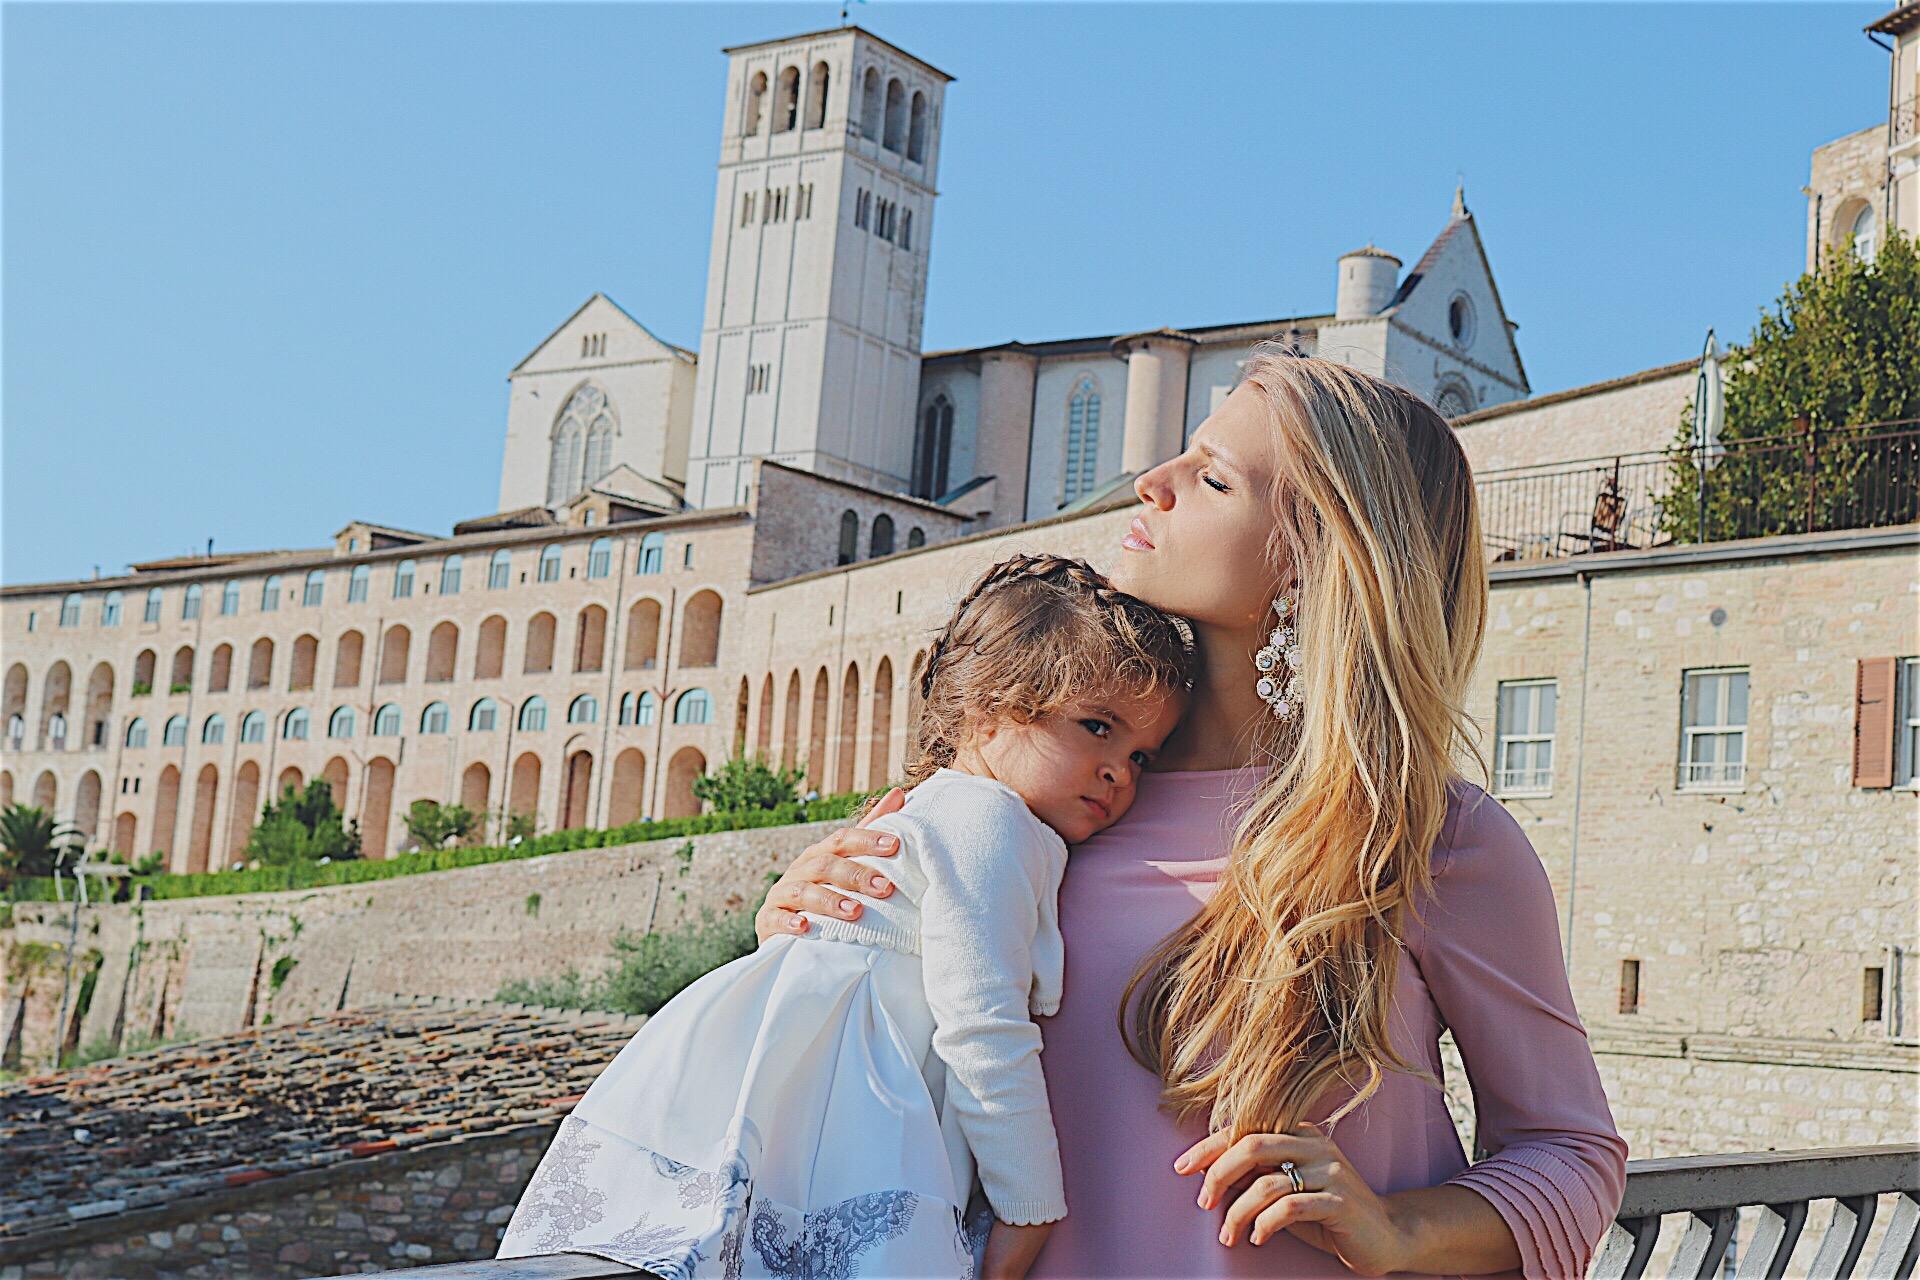 Gli outlet più famosi d'Italia Crumbs of Life